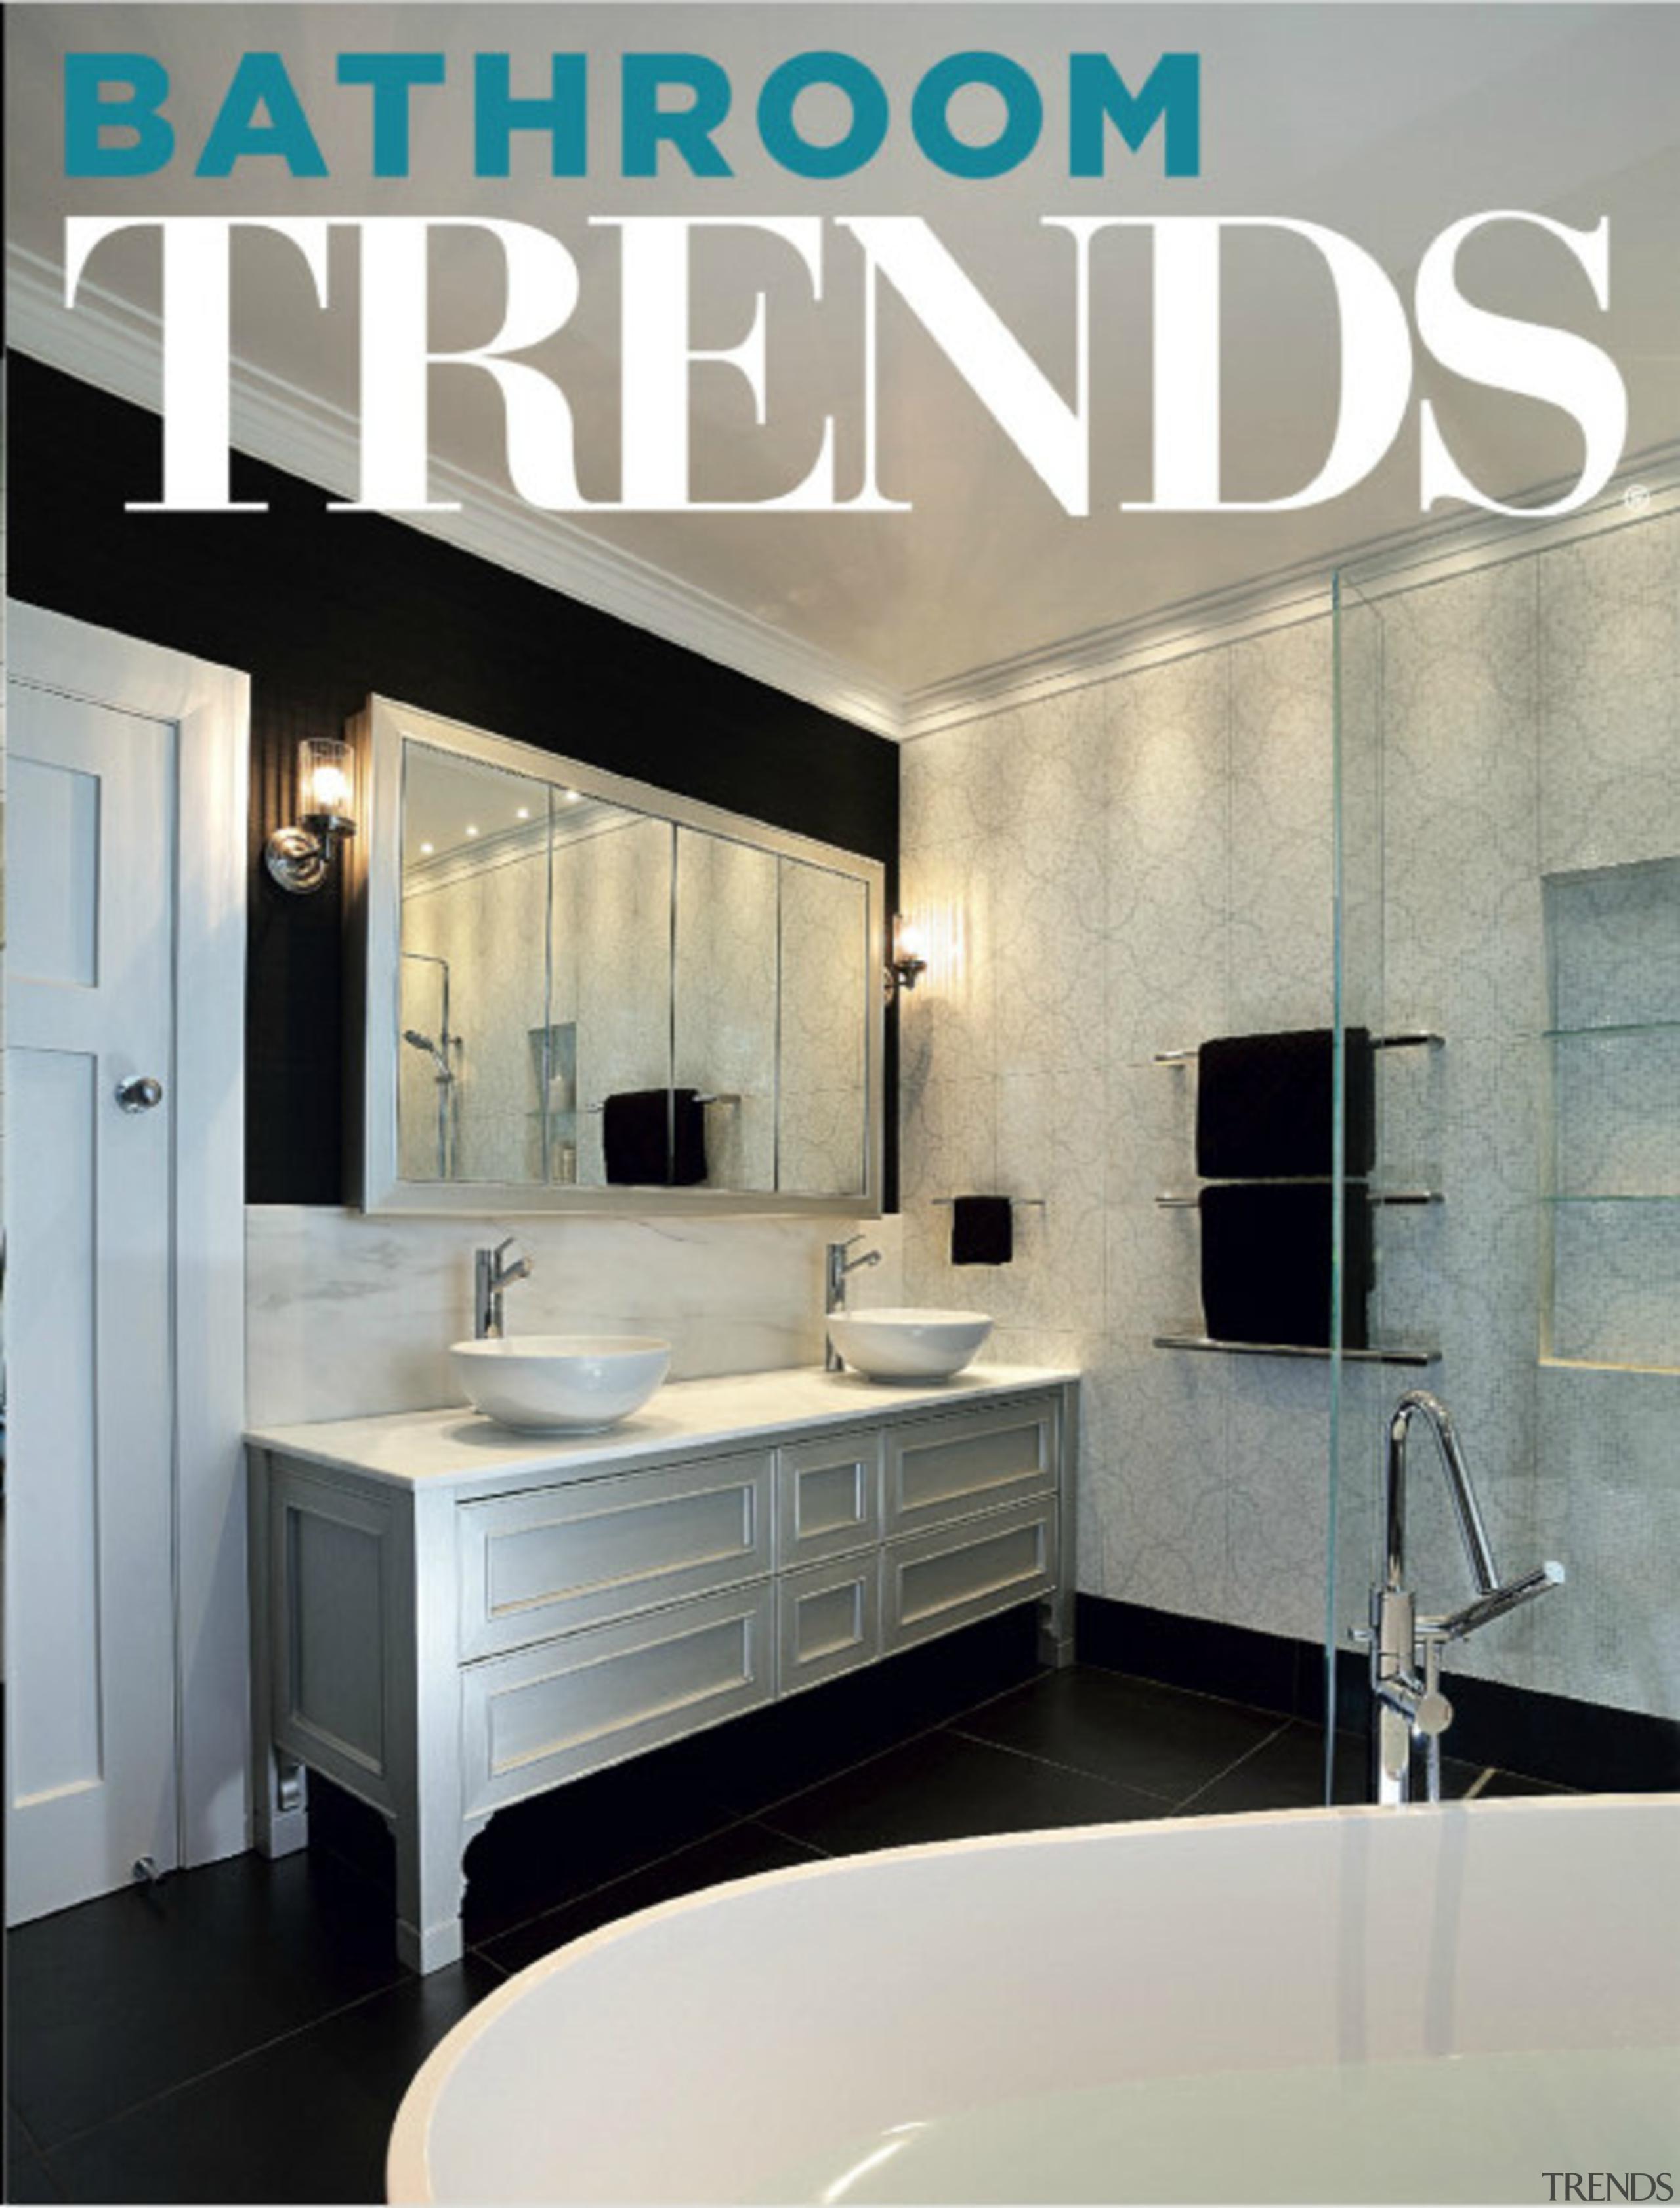 nz2908bathroom cover.png - nz2908bathroom_cover.png - bathroom | floor bathroom, floor, flooring, interior design, room, sink, gray